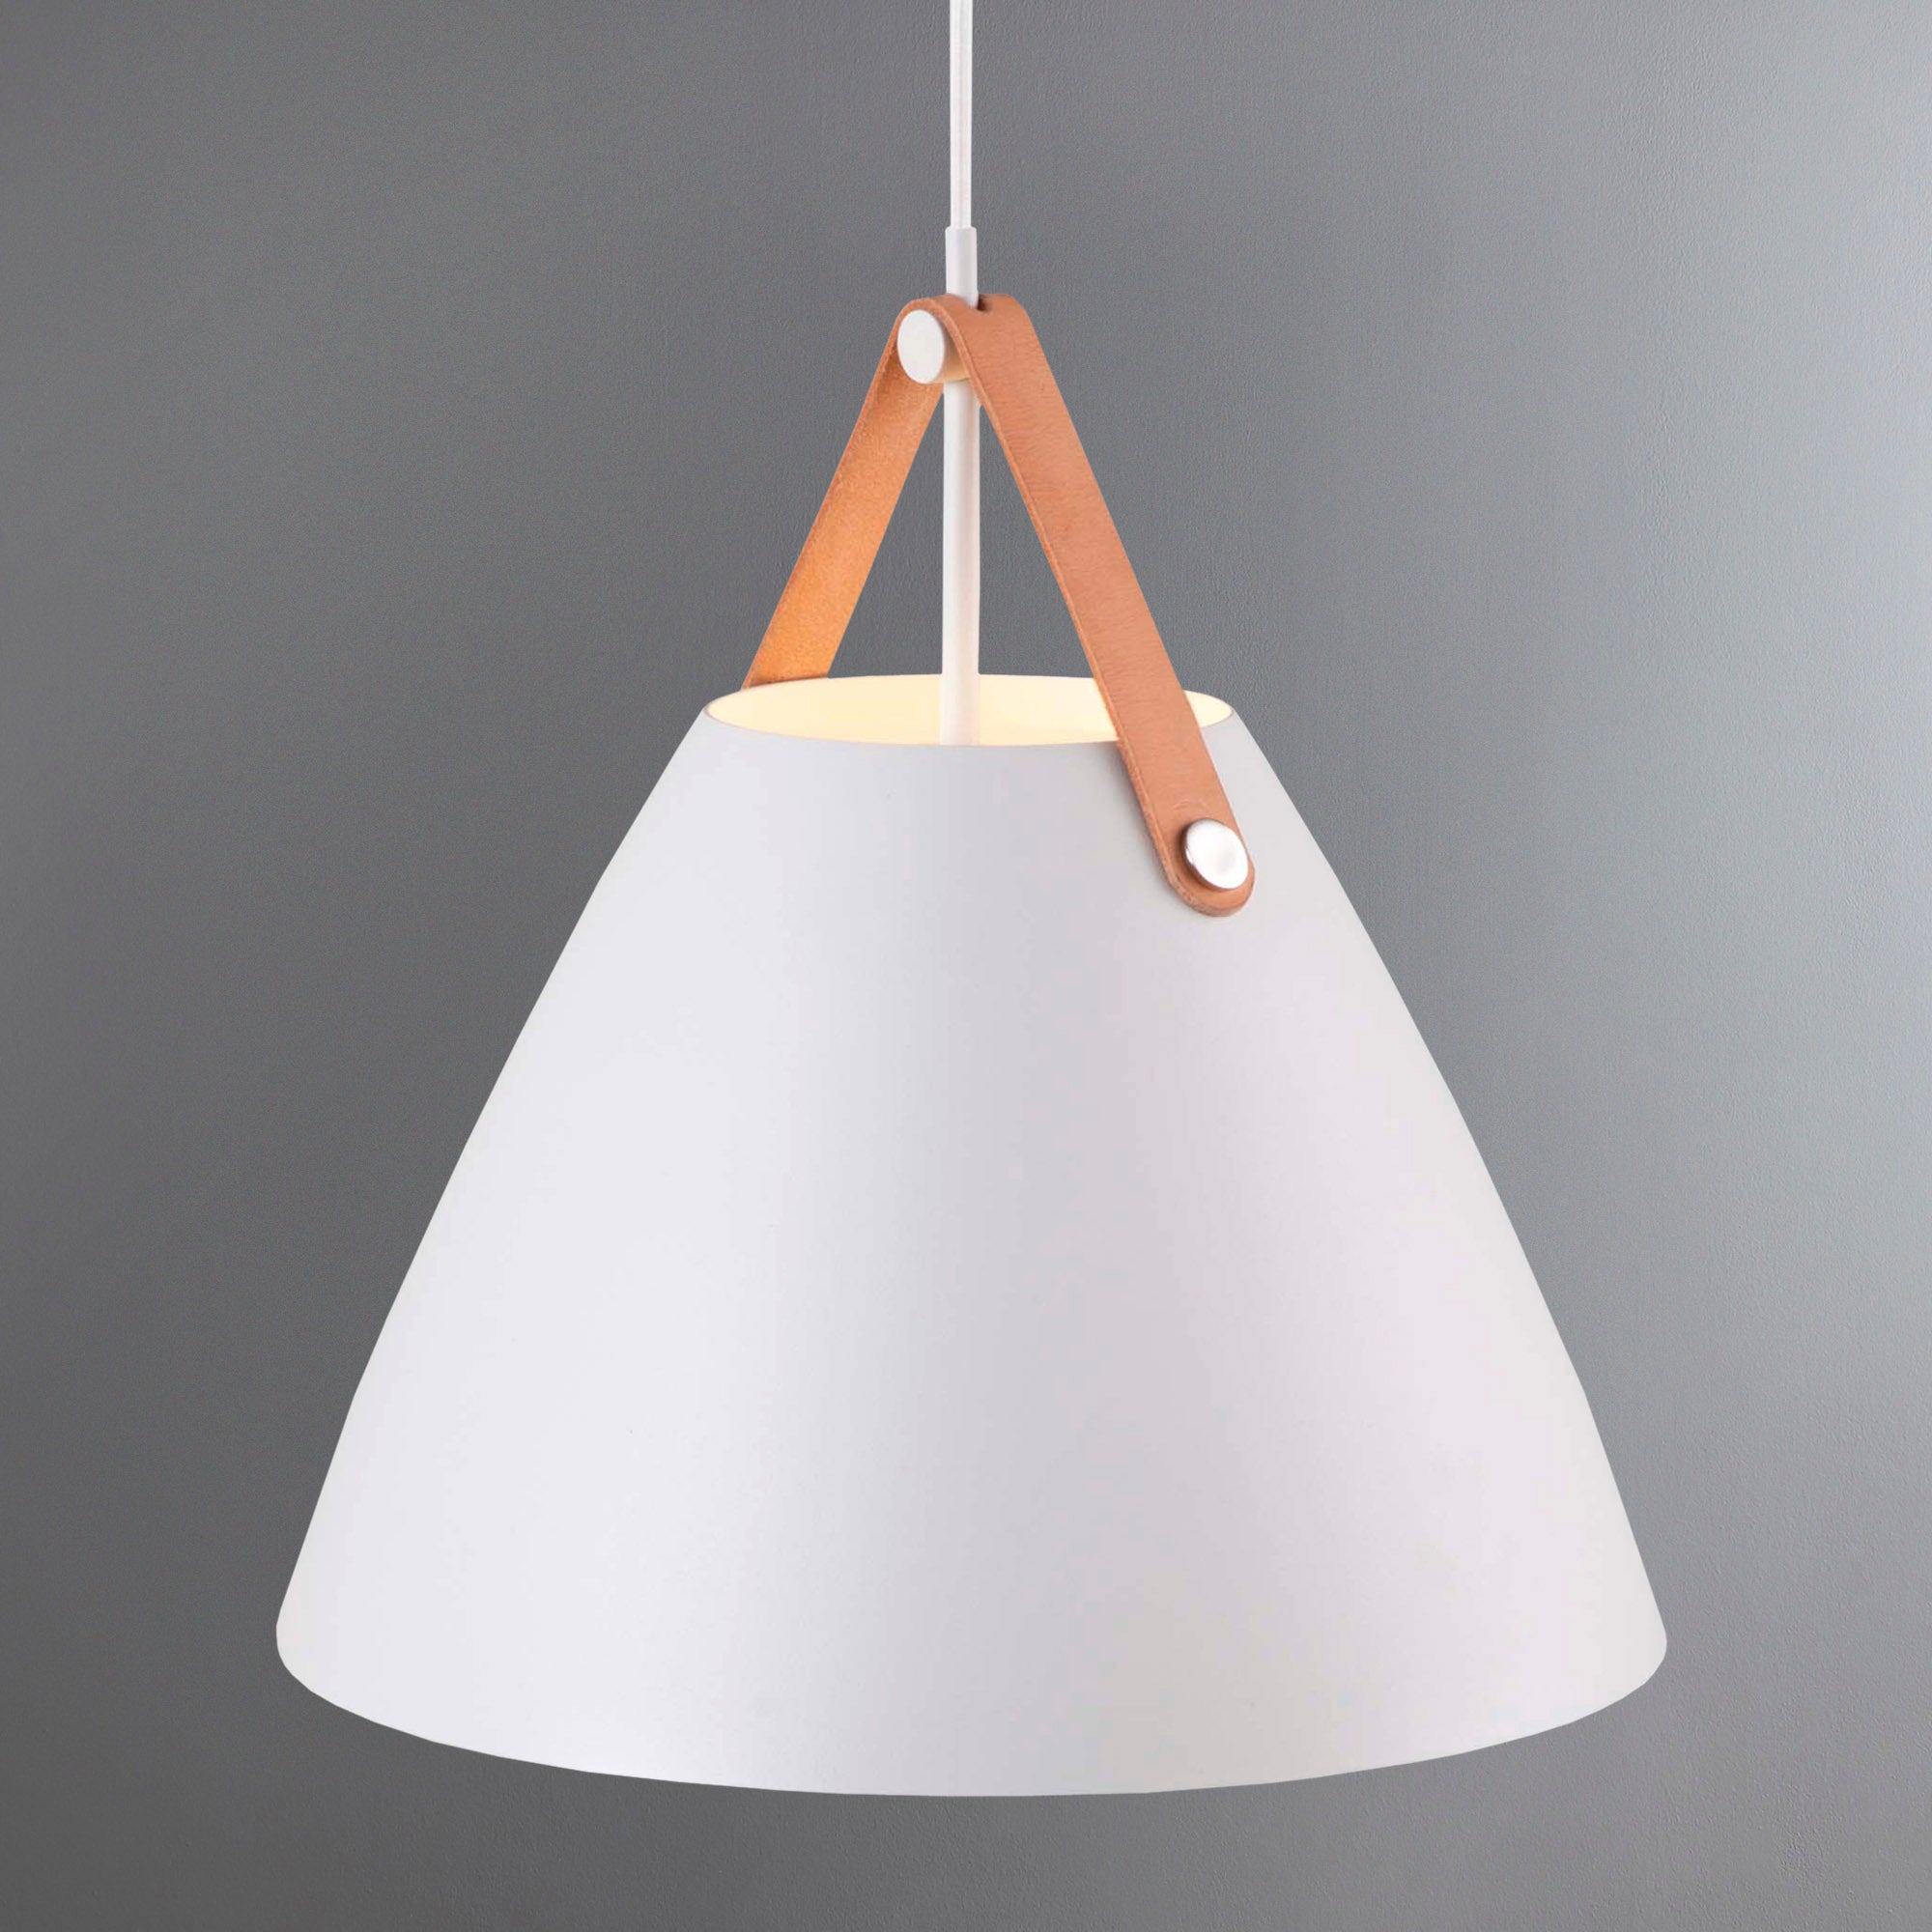 Photo of Strap medium white pendant light fitting white